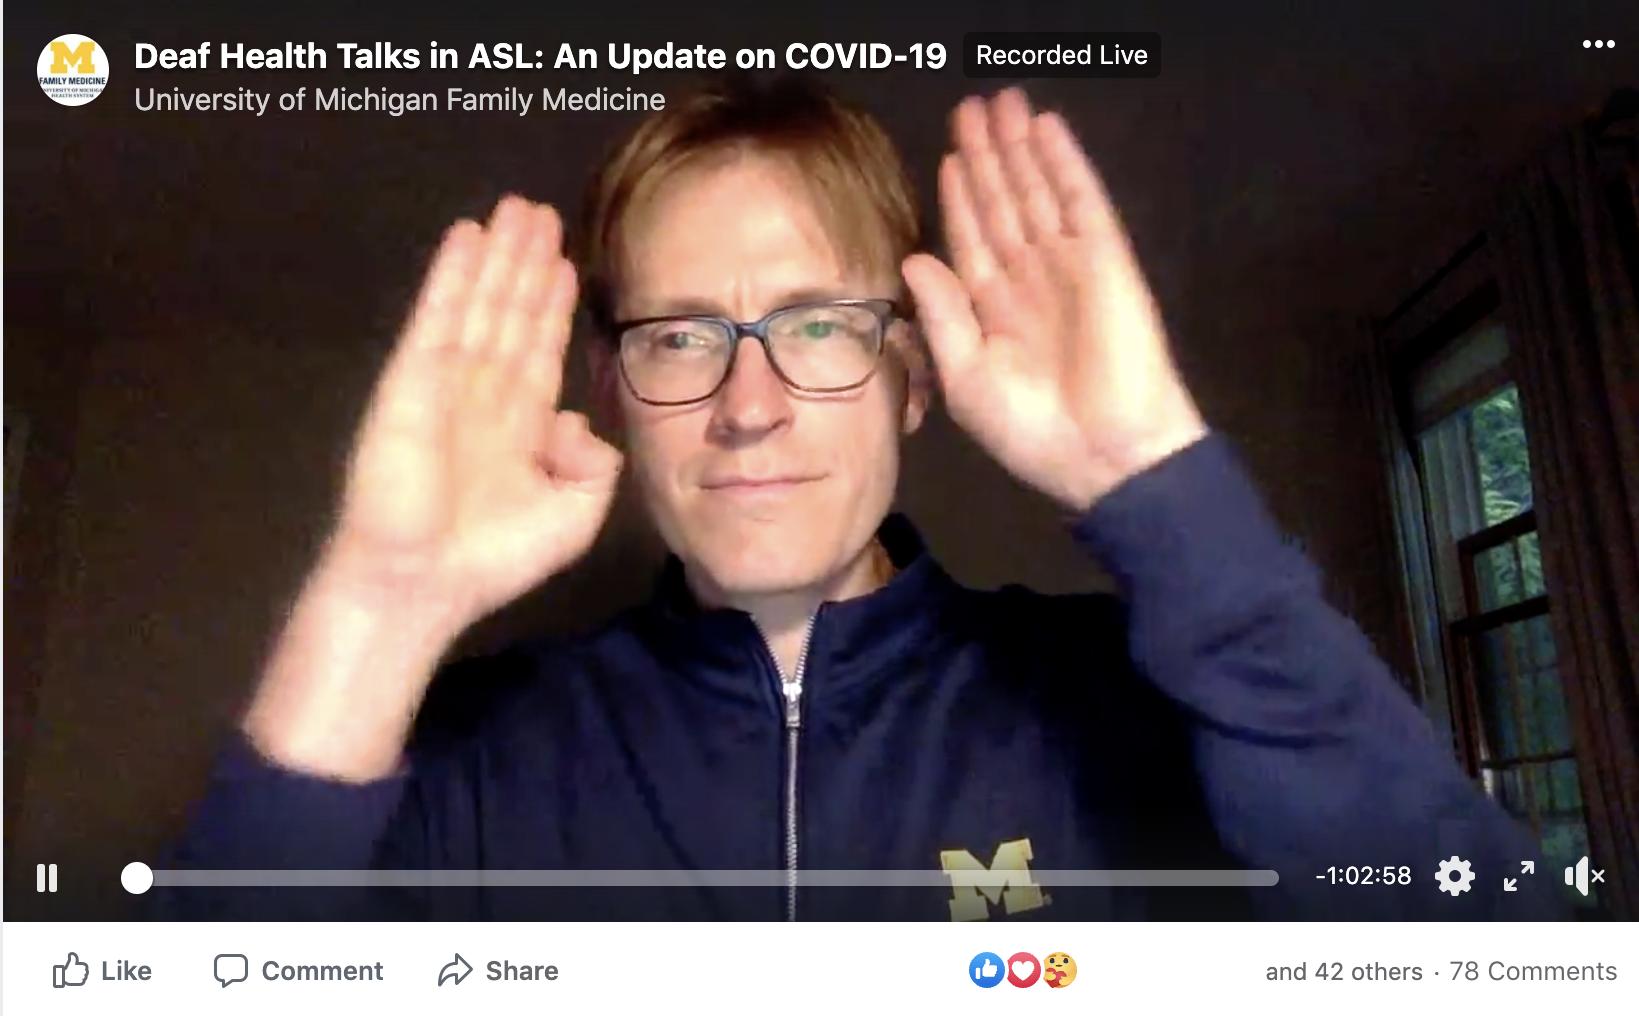 deaf health talk on covid-19 screenshot